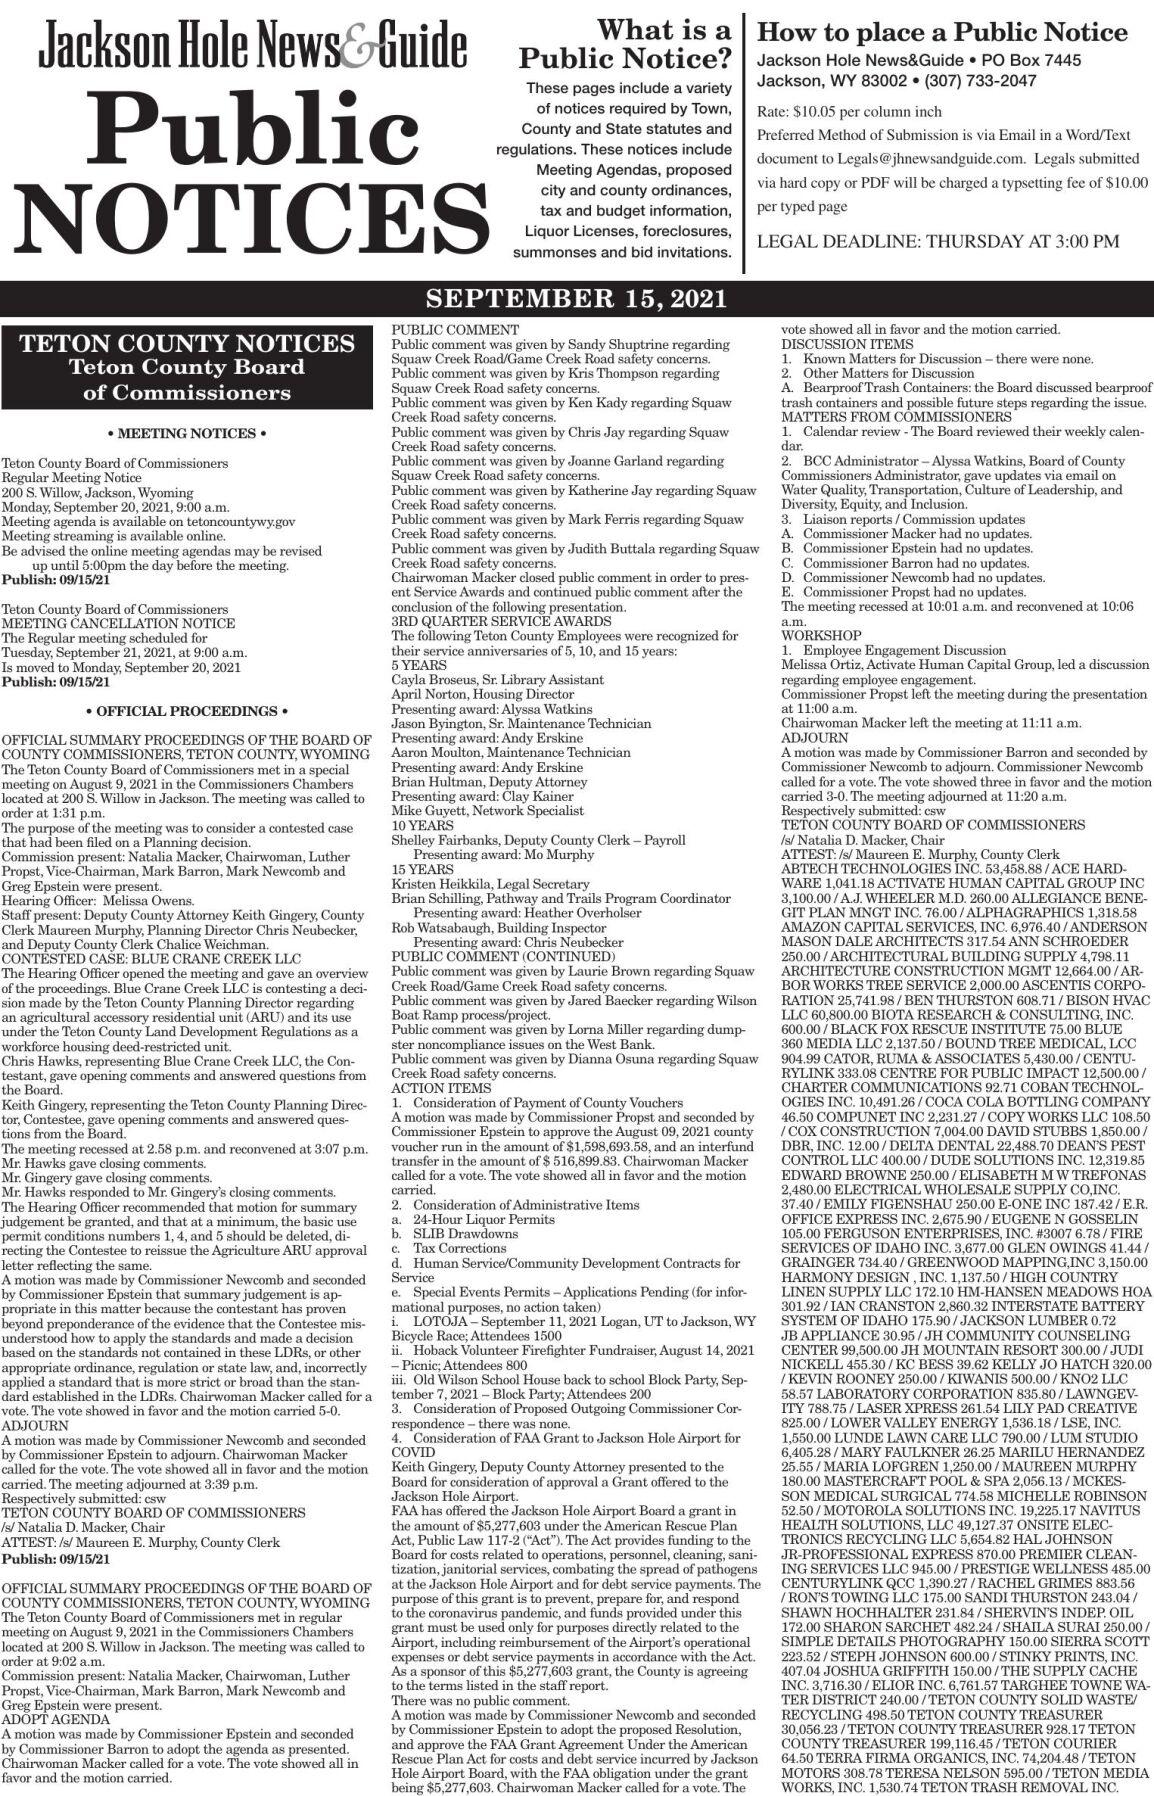 Public Notices, Sept. 15, 2021